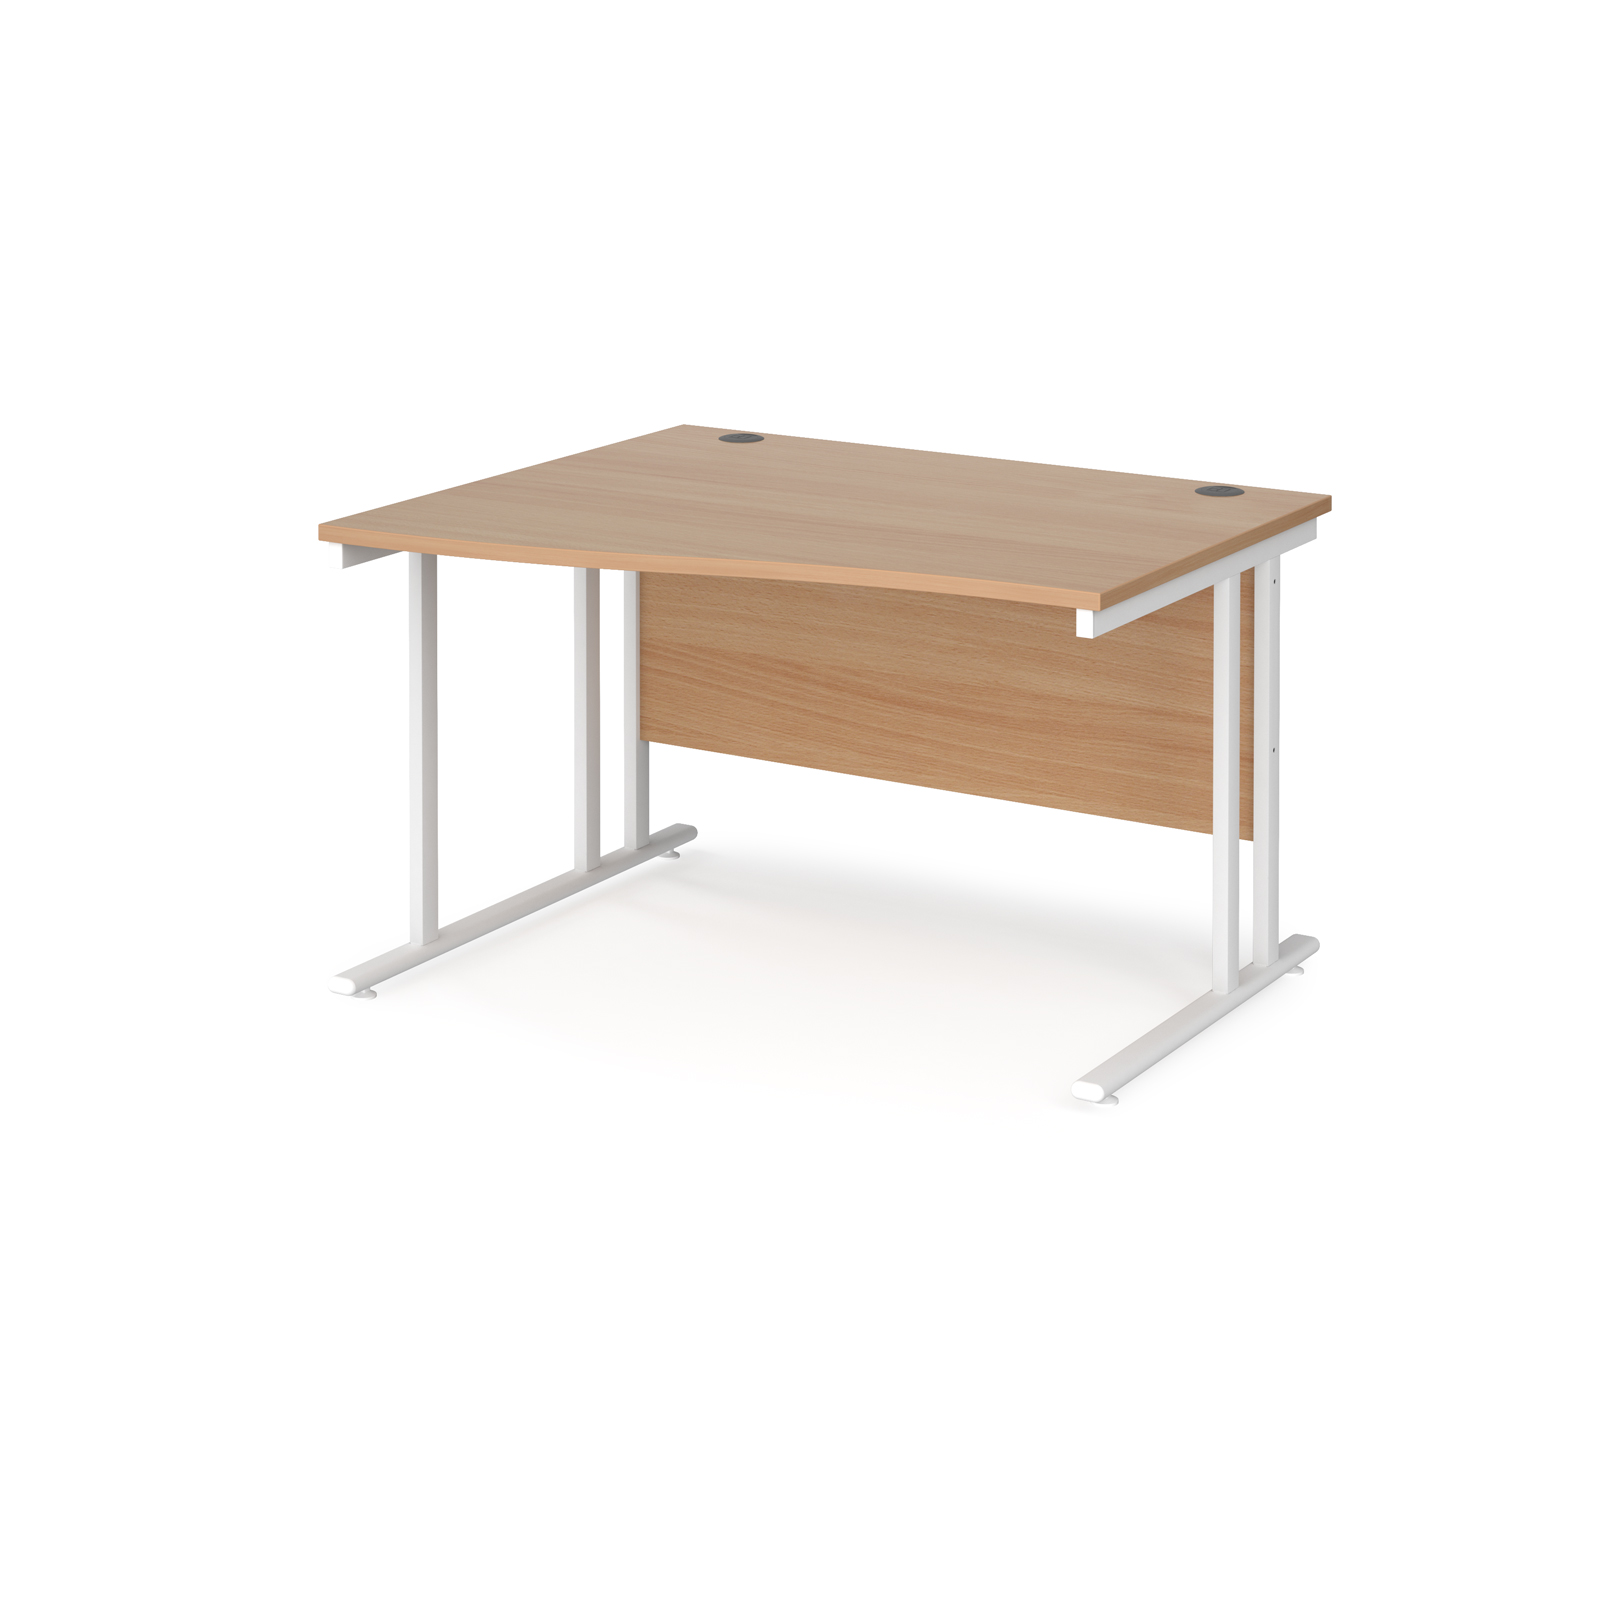 Left Handed Maestro 25 left hand wave desk 1200mm wide - white cantilever leg frame, beech top